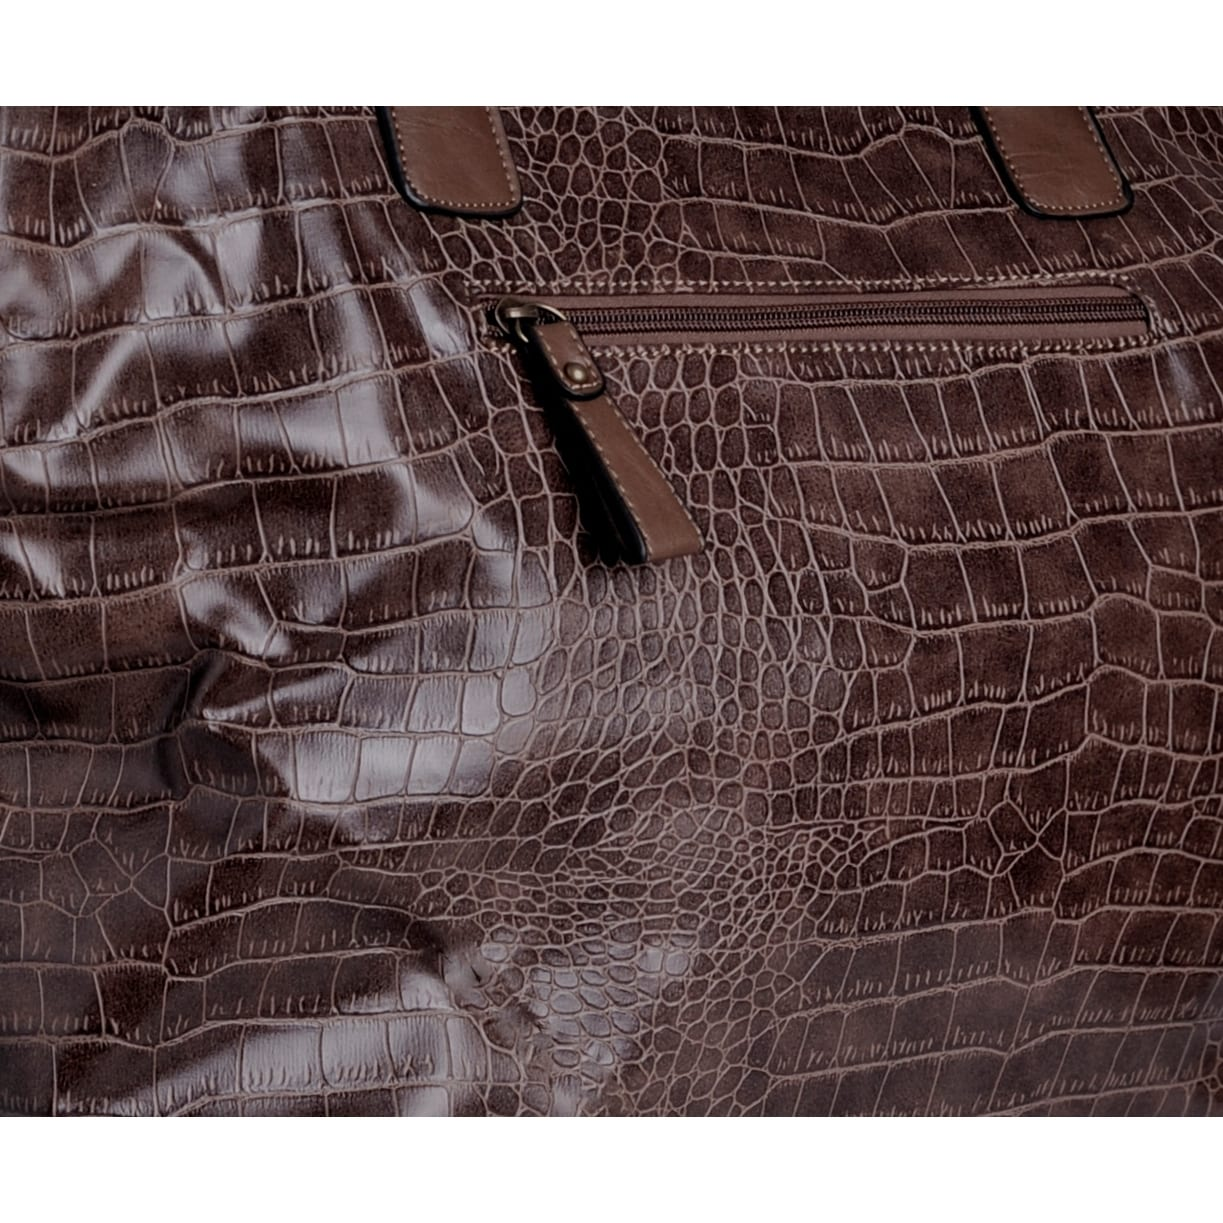 c242cc200dde Shop David Jones Women's Faux Crocodile Tote Bag - Free Shipping Today -  Overstock - 9641981